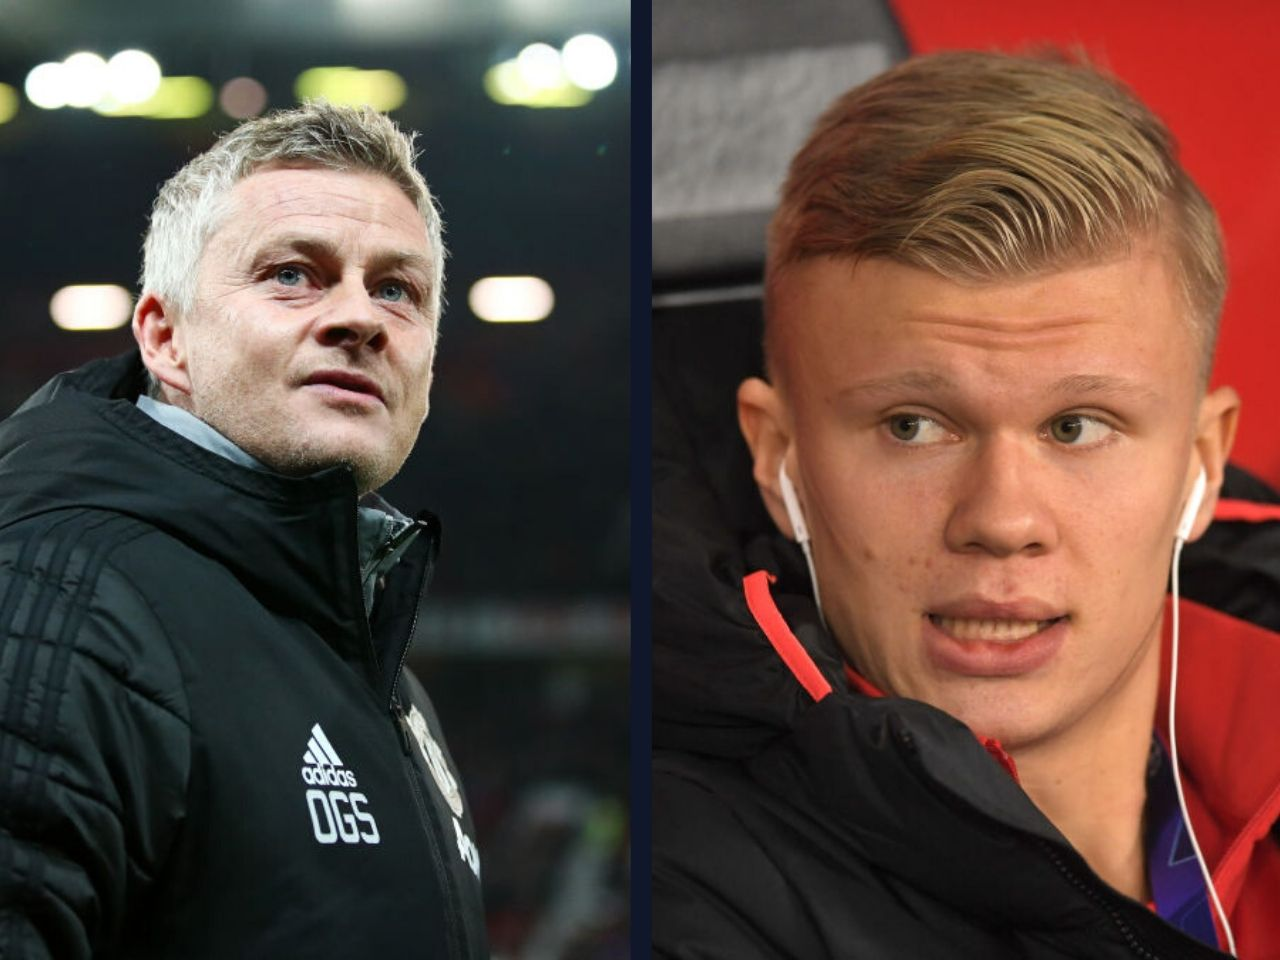 Ole Gunnar Solskjaer, Erling-Braut Haaland, RB Salzburg, Manchester United, Premier League